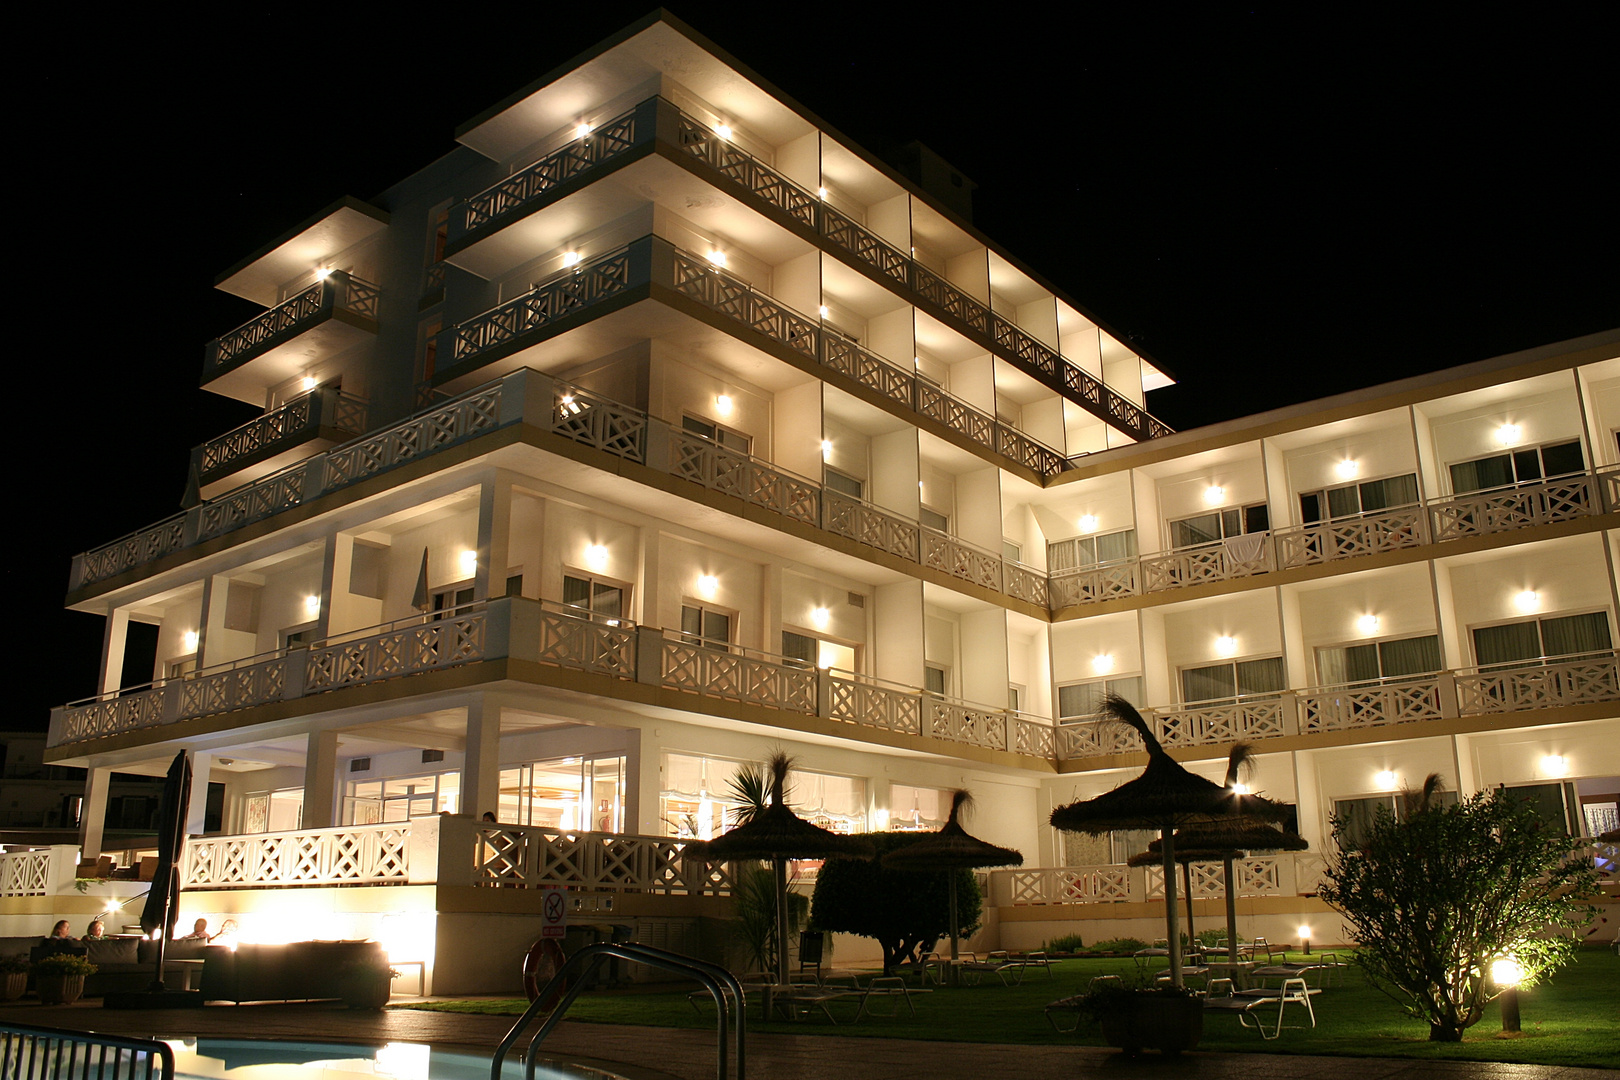 Hotel Santo Tomas bei Nacht